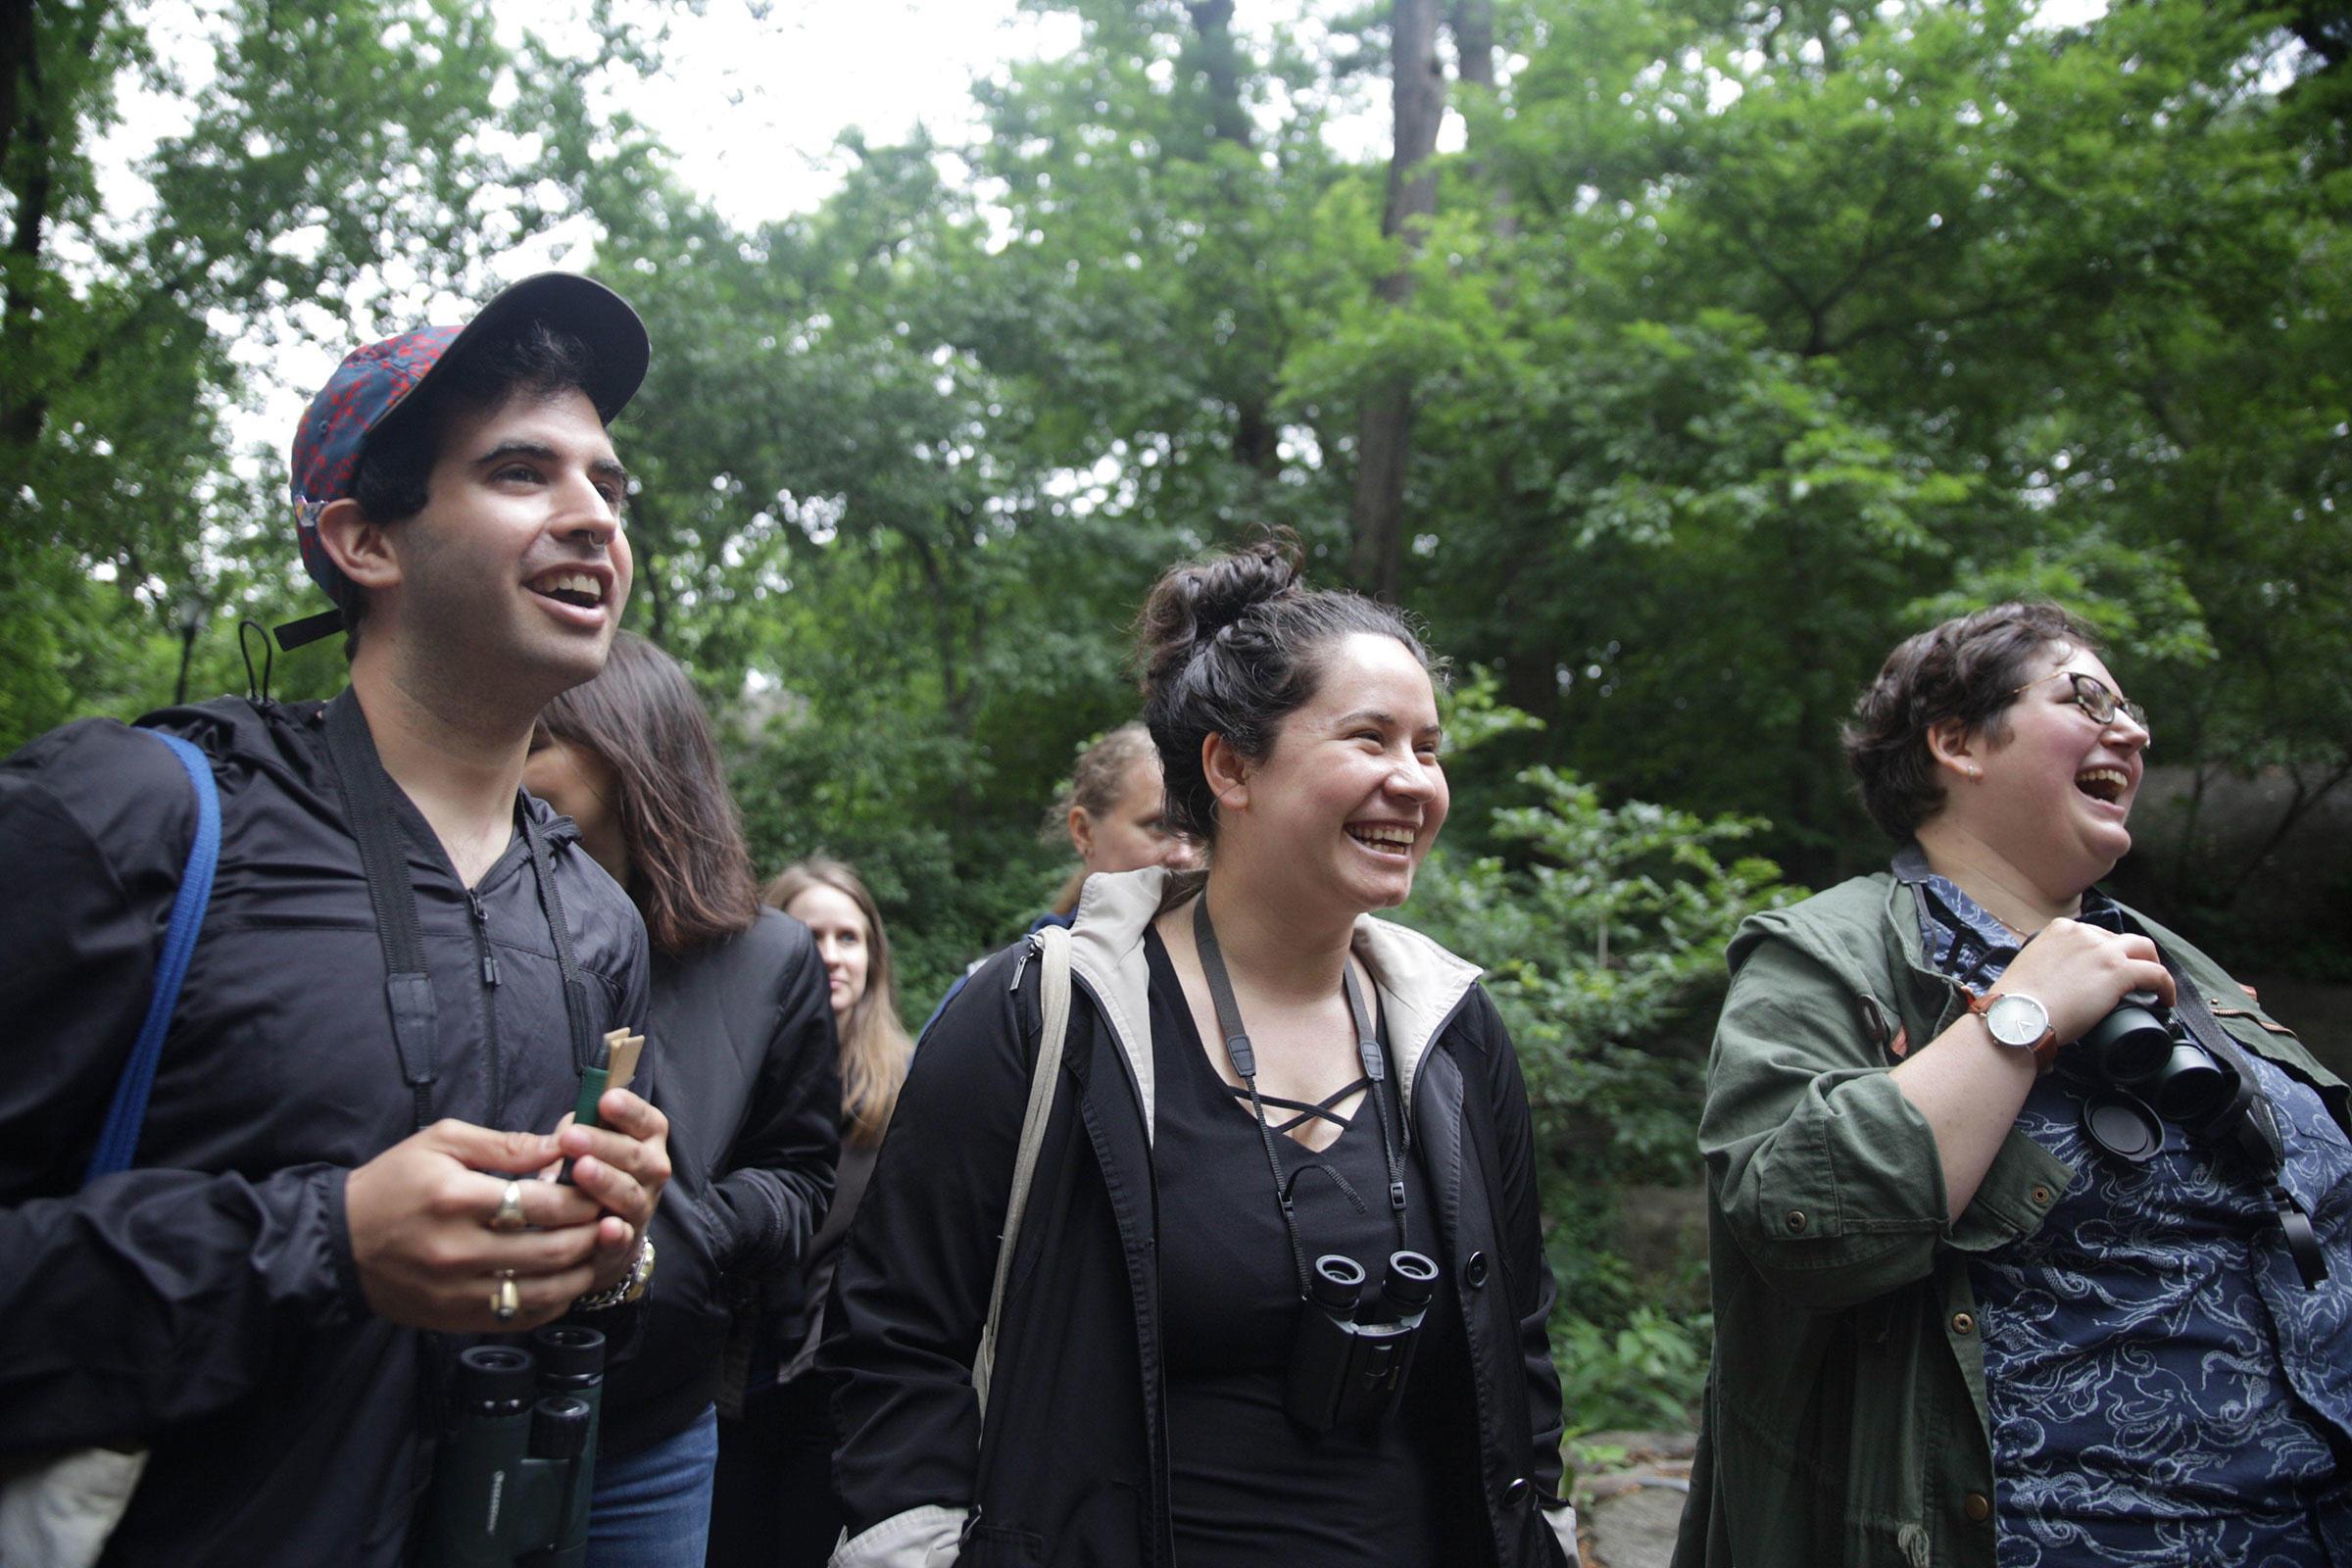 Birders in New York City get a pep talk from the Let's Go Birding Together walk organizers. Eileen Solange Rodriguez/Audubon